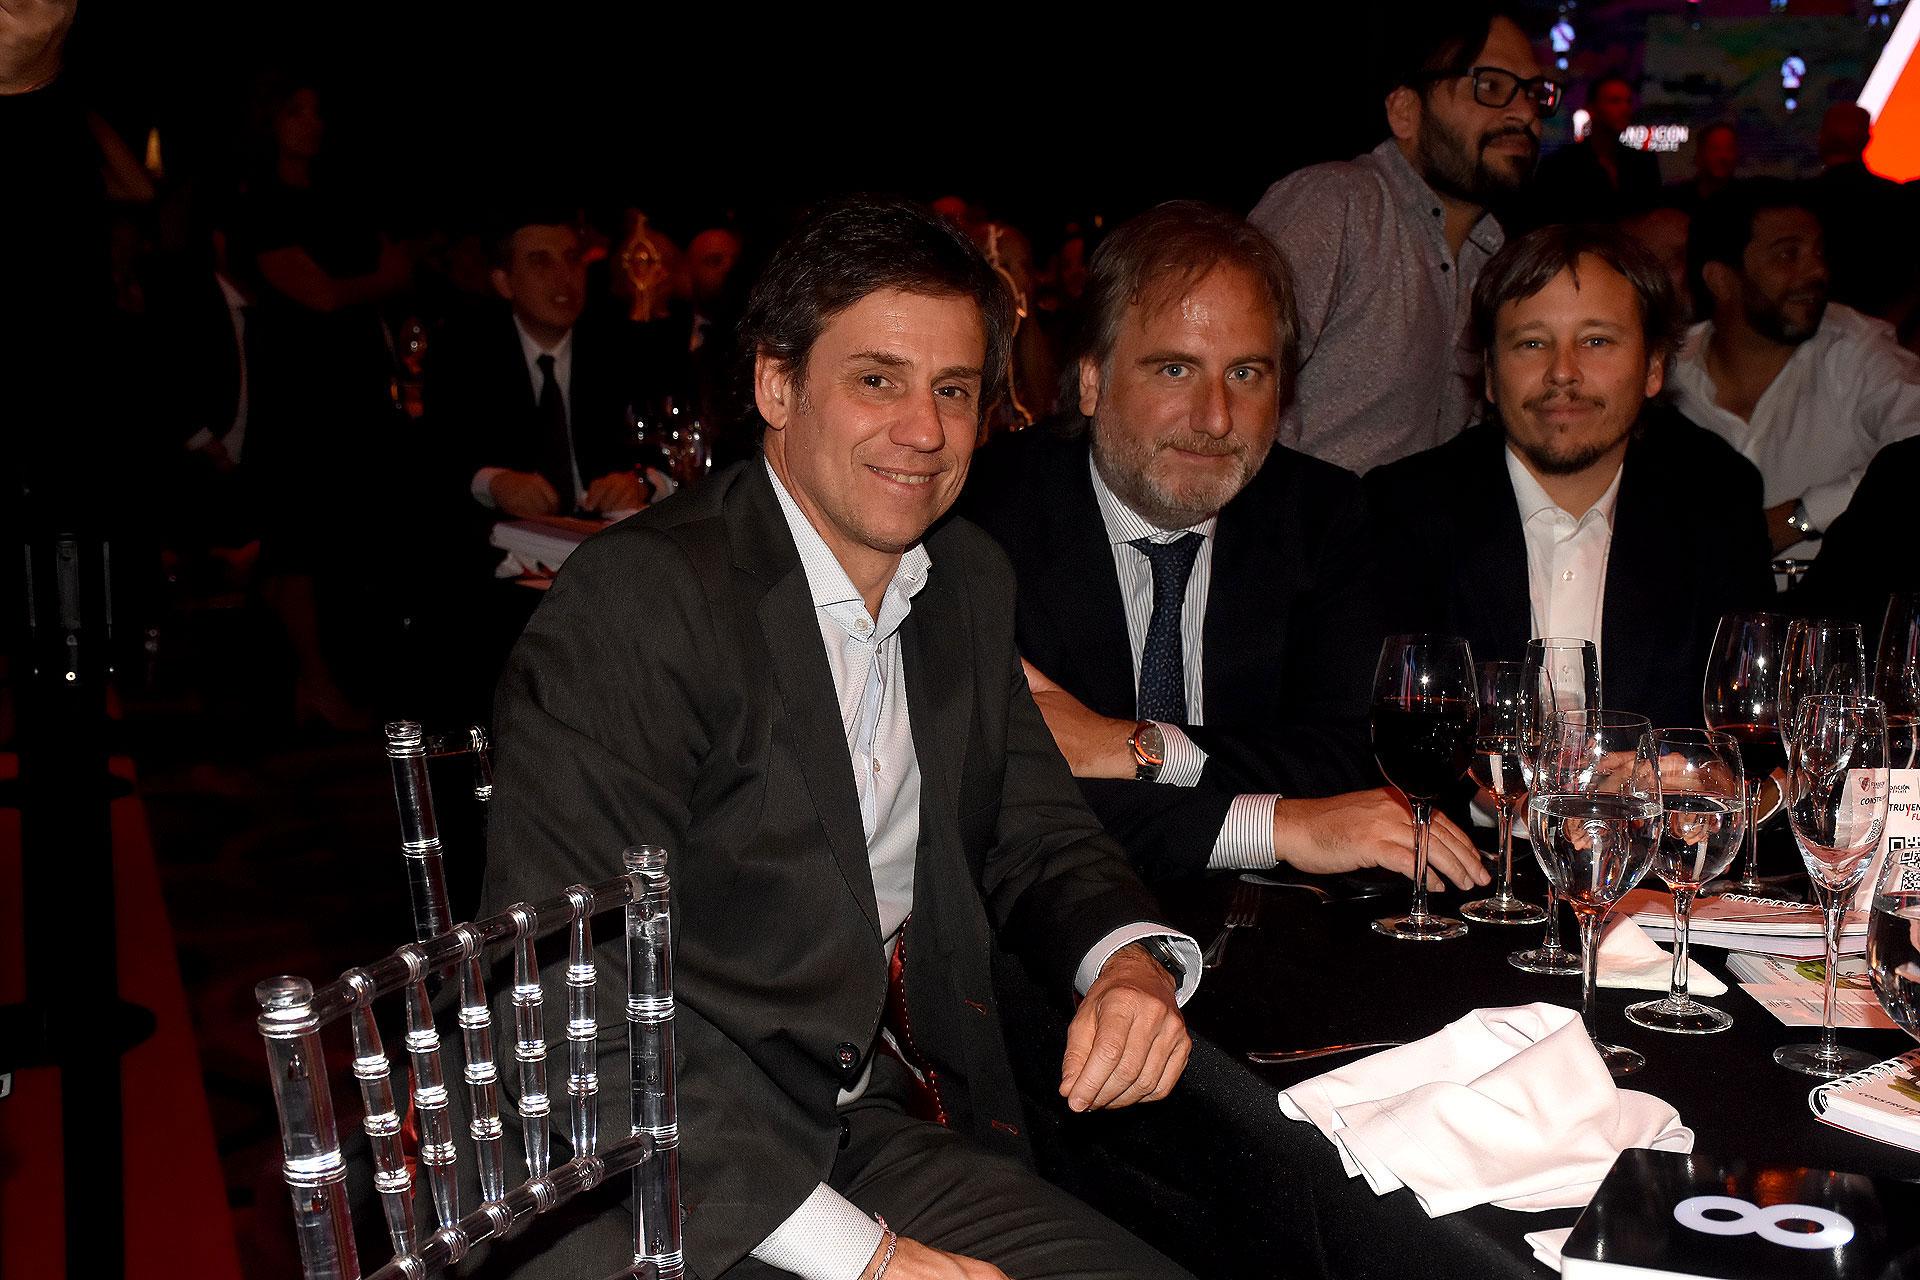 Santiago Poblet Videla, Tato Lanusse y Facundo Fravega